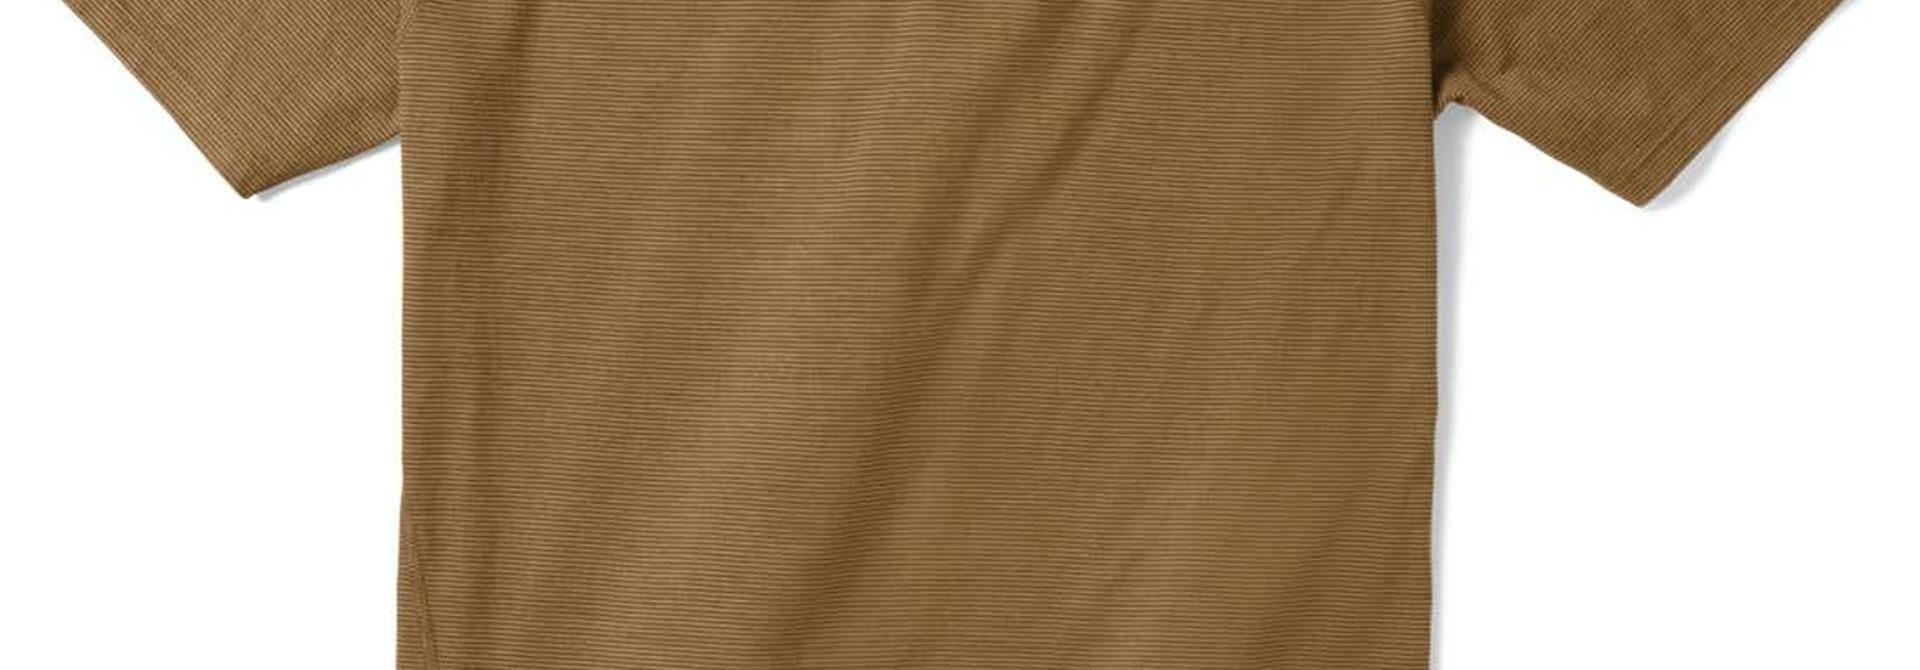 Men's 150 Pattern Short Sleeve Baselayer